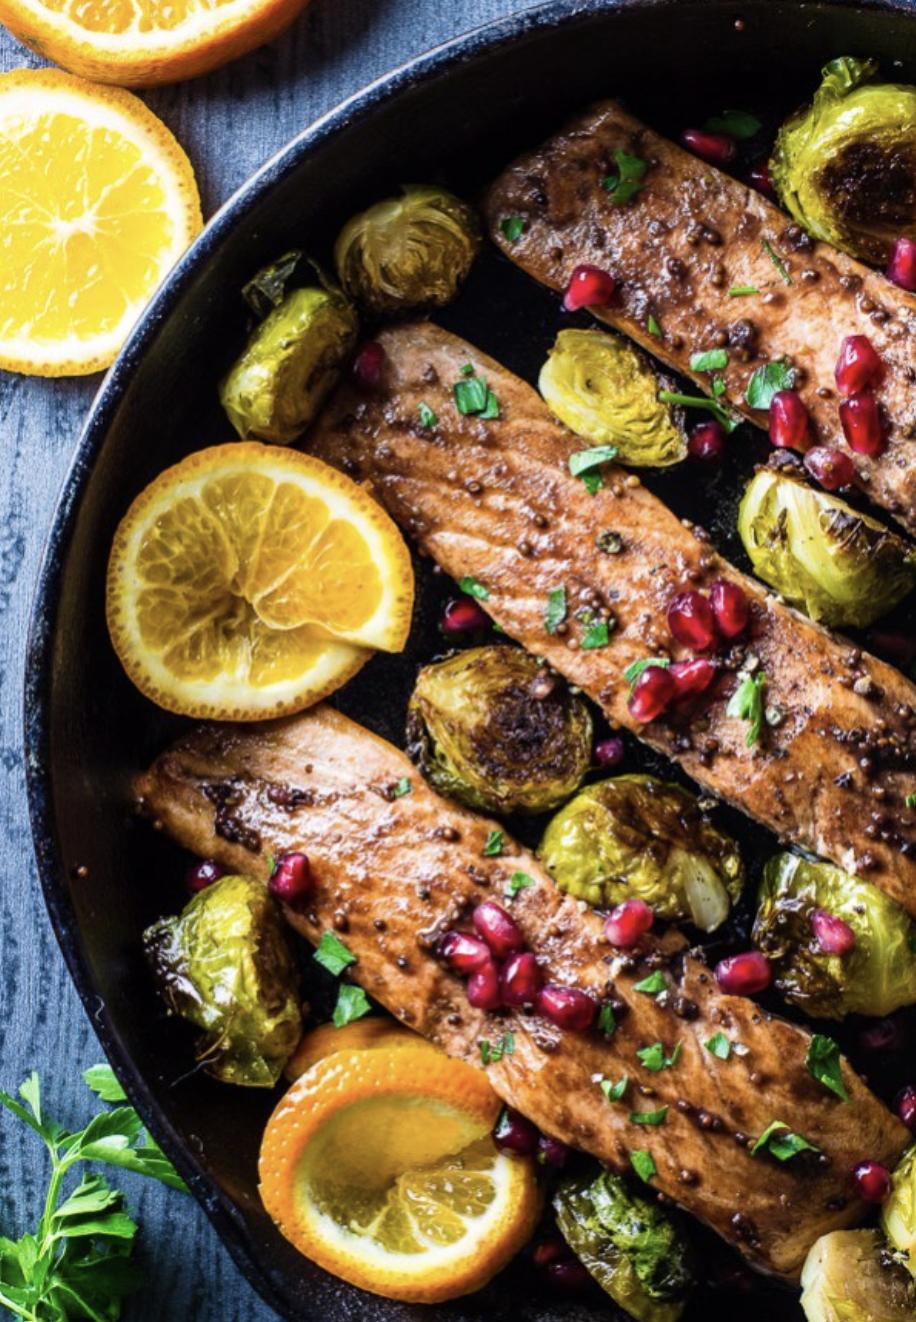 Top 6 Brain-Boosting Seafood Recipes